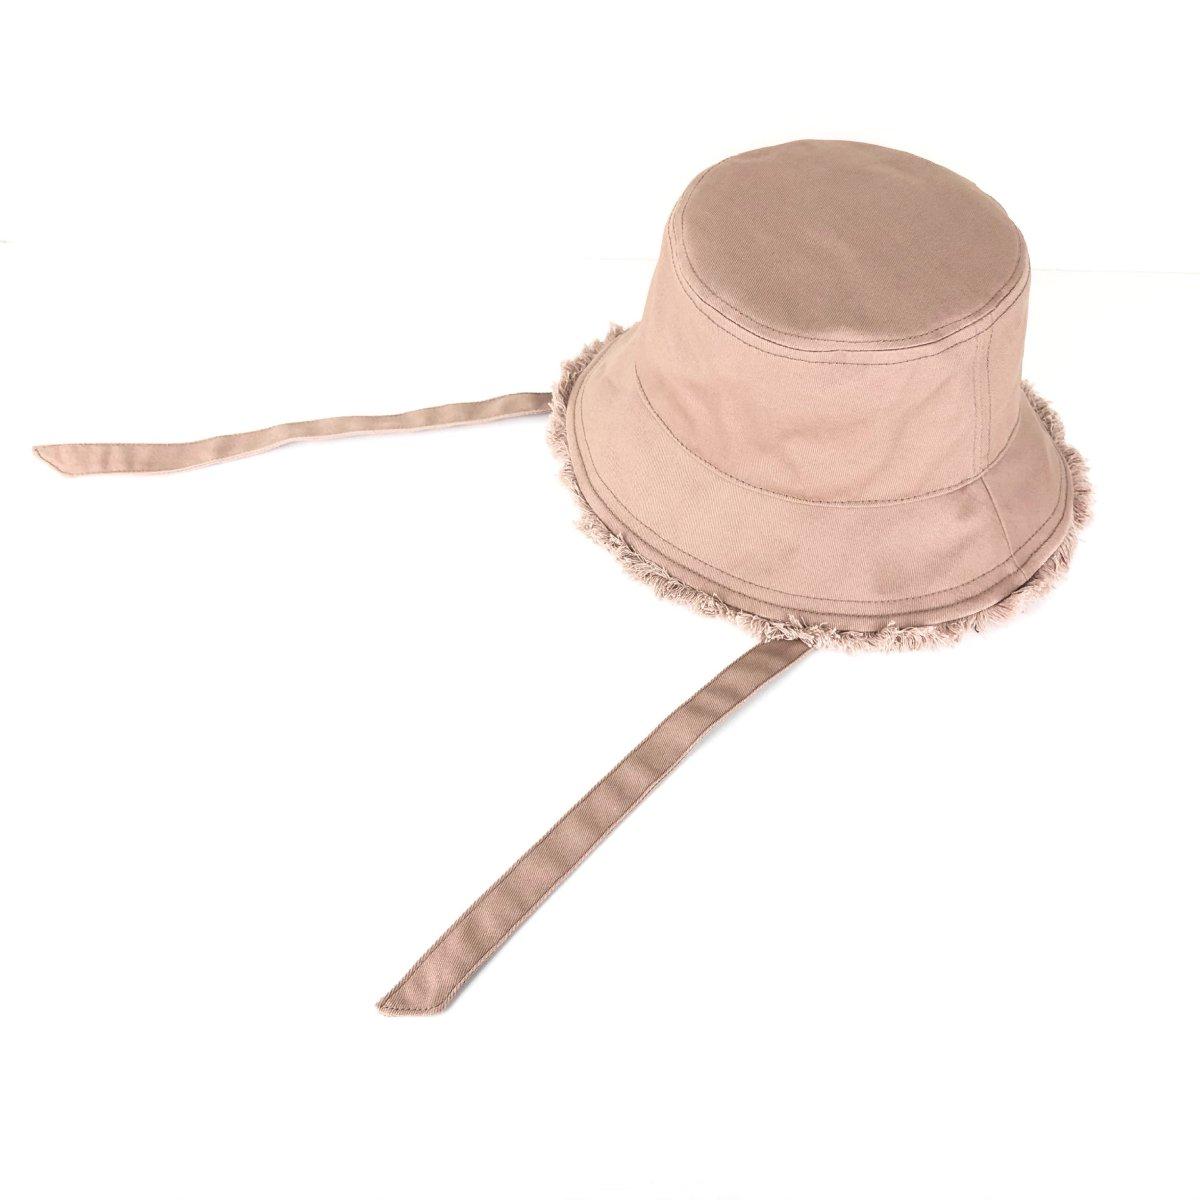 【BABY】Baby Fringe Hat 詳細画像3